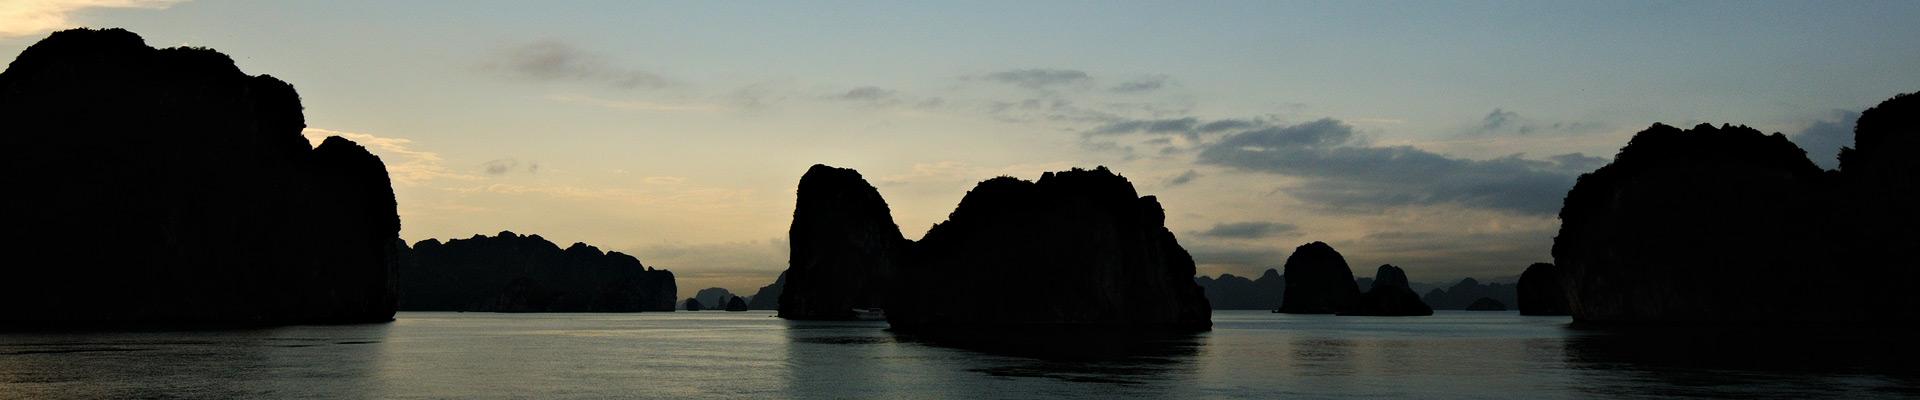 Top image baie d'Halong, Vietnam